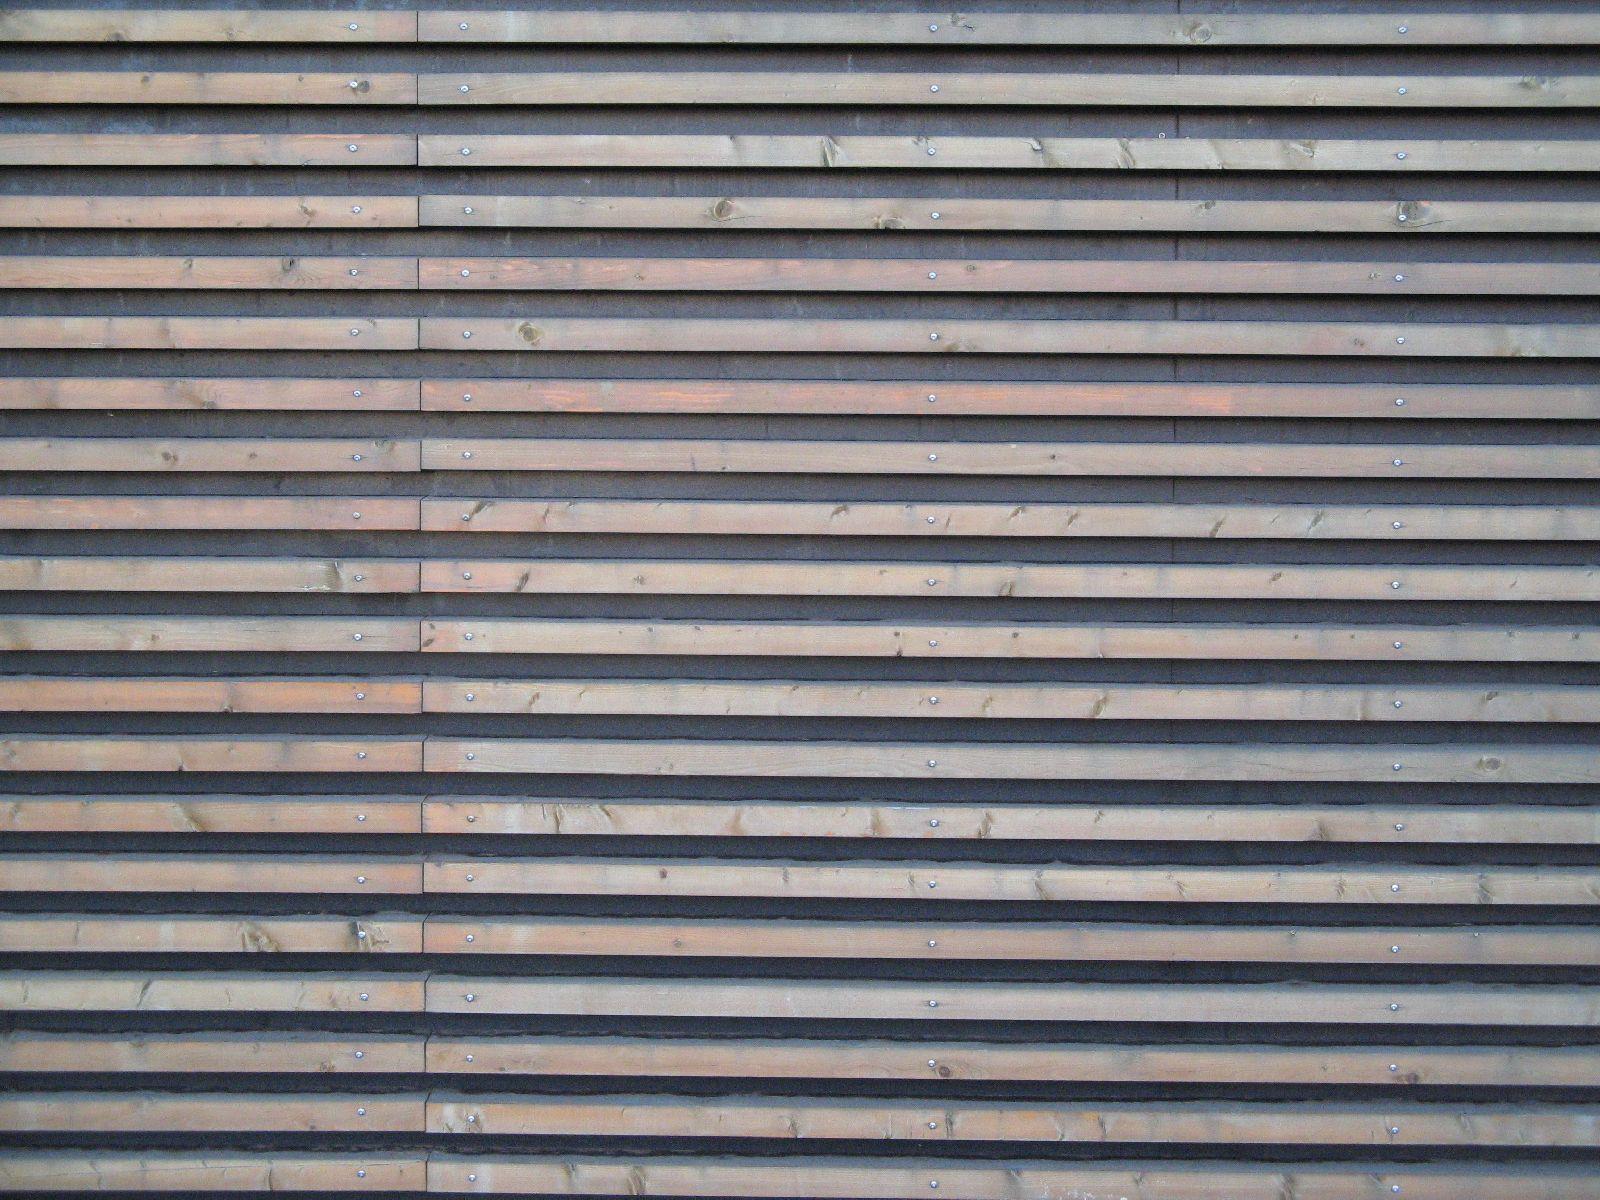 Wood_Textures_B_4993